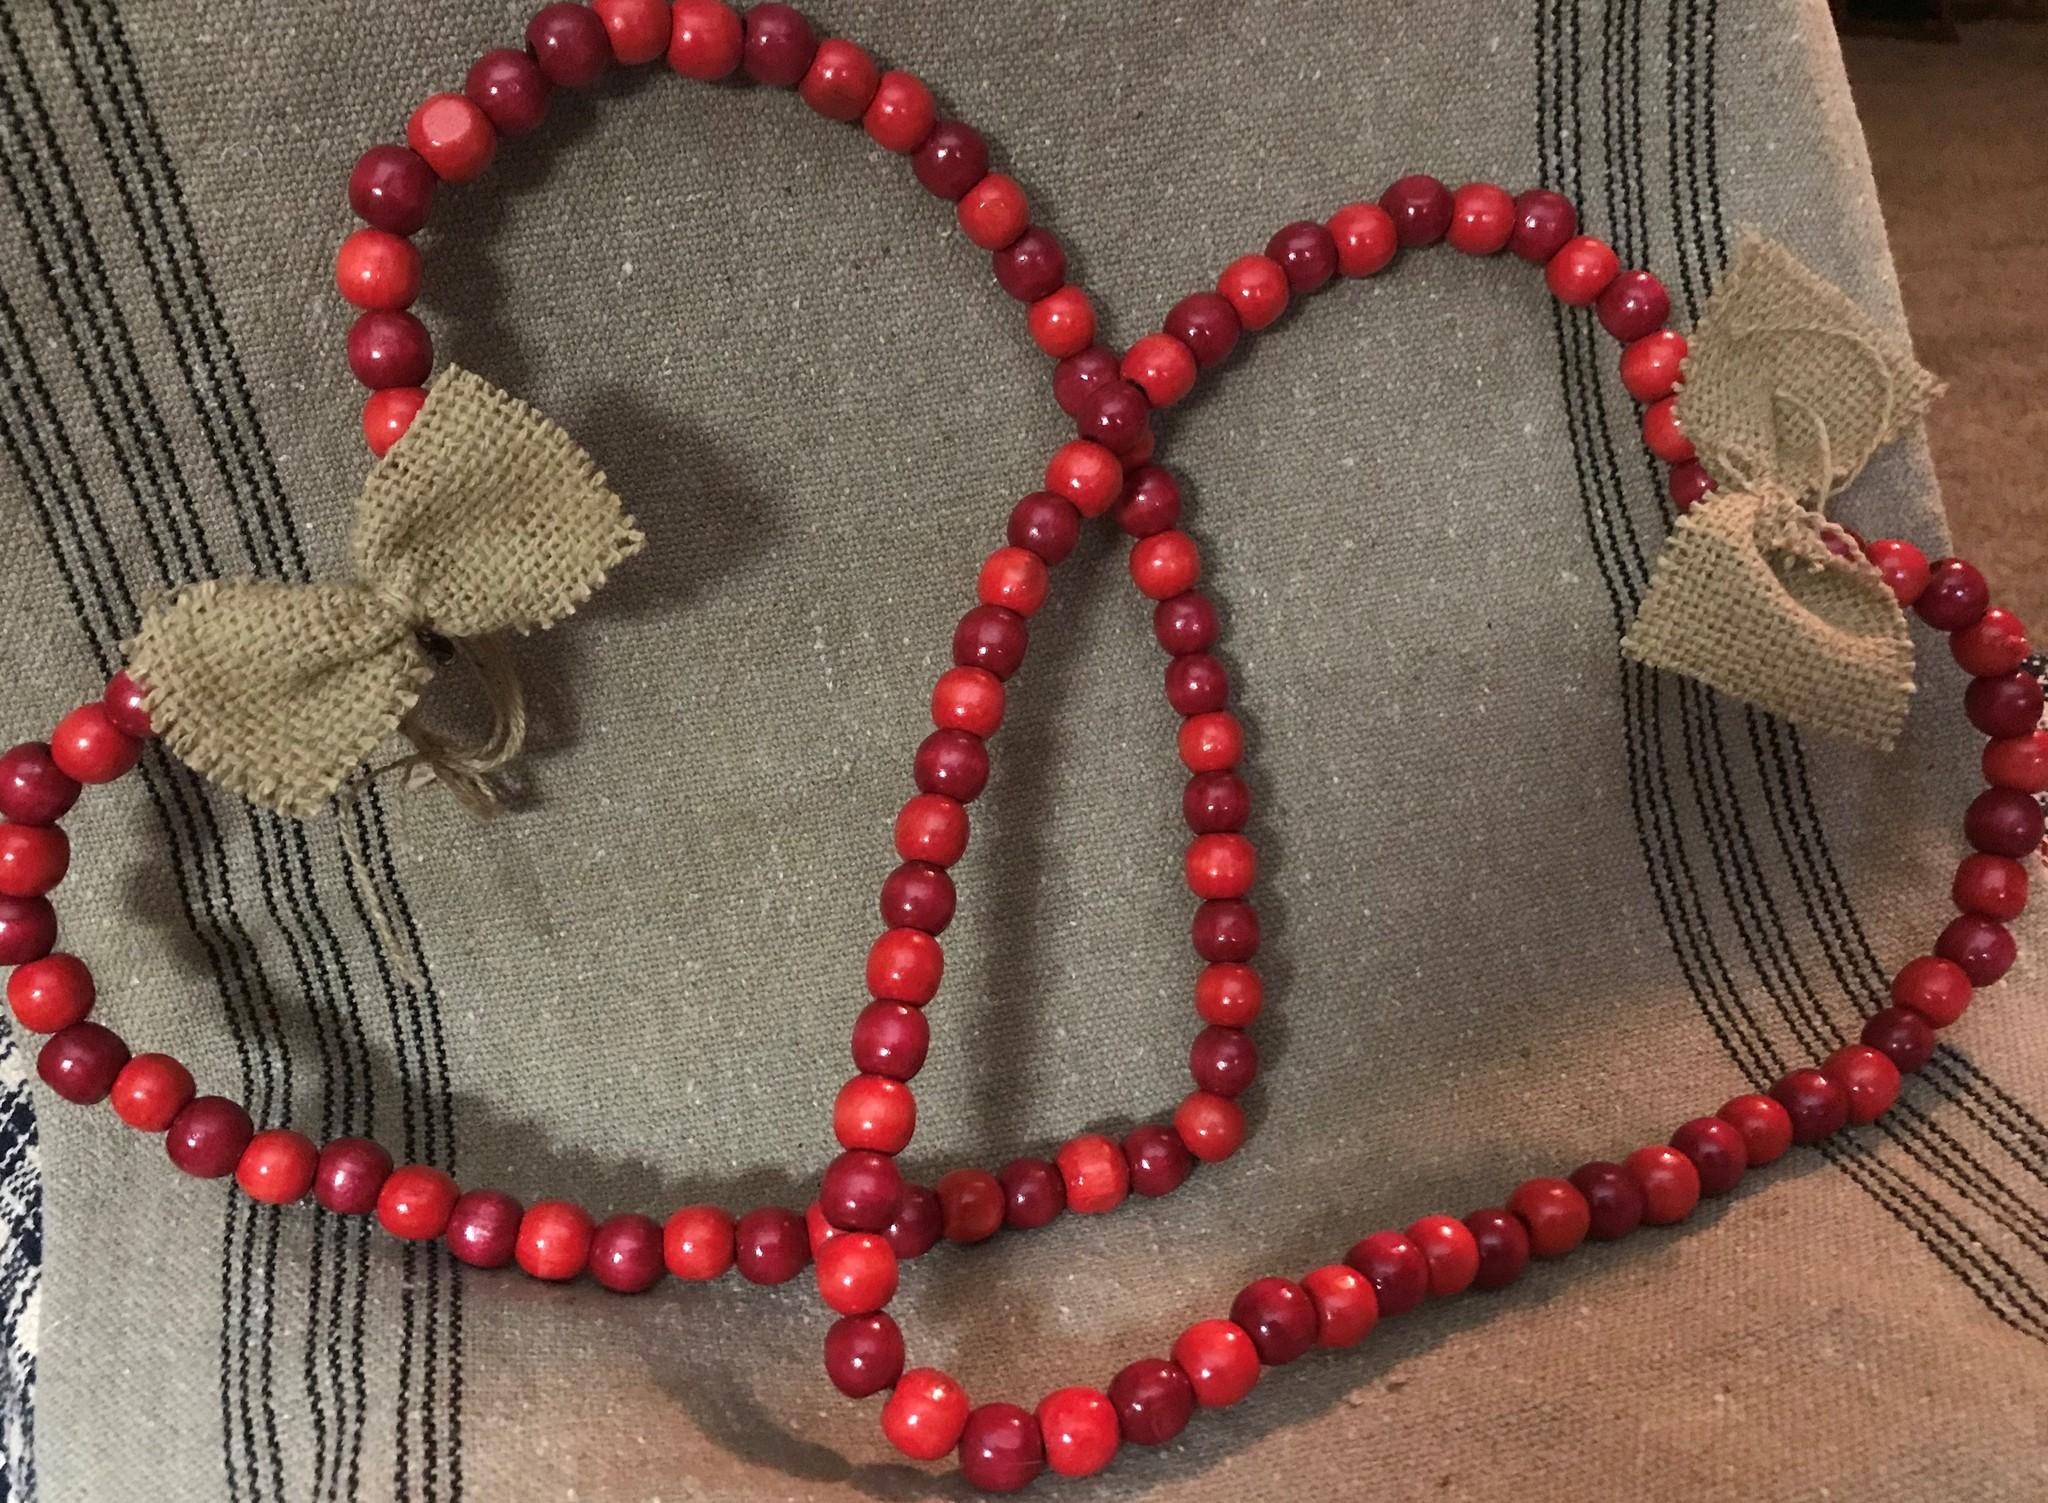 Homemade Red Wooden Bead Heart